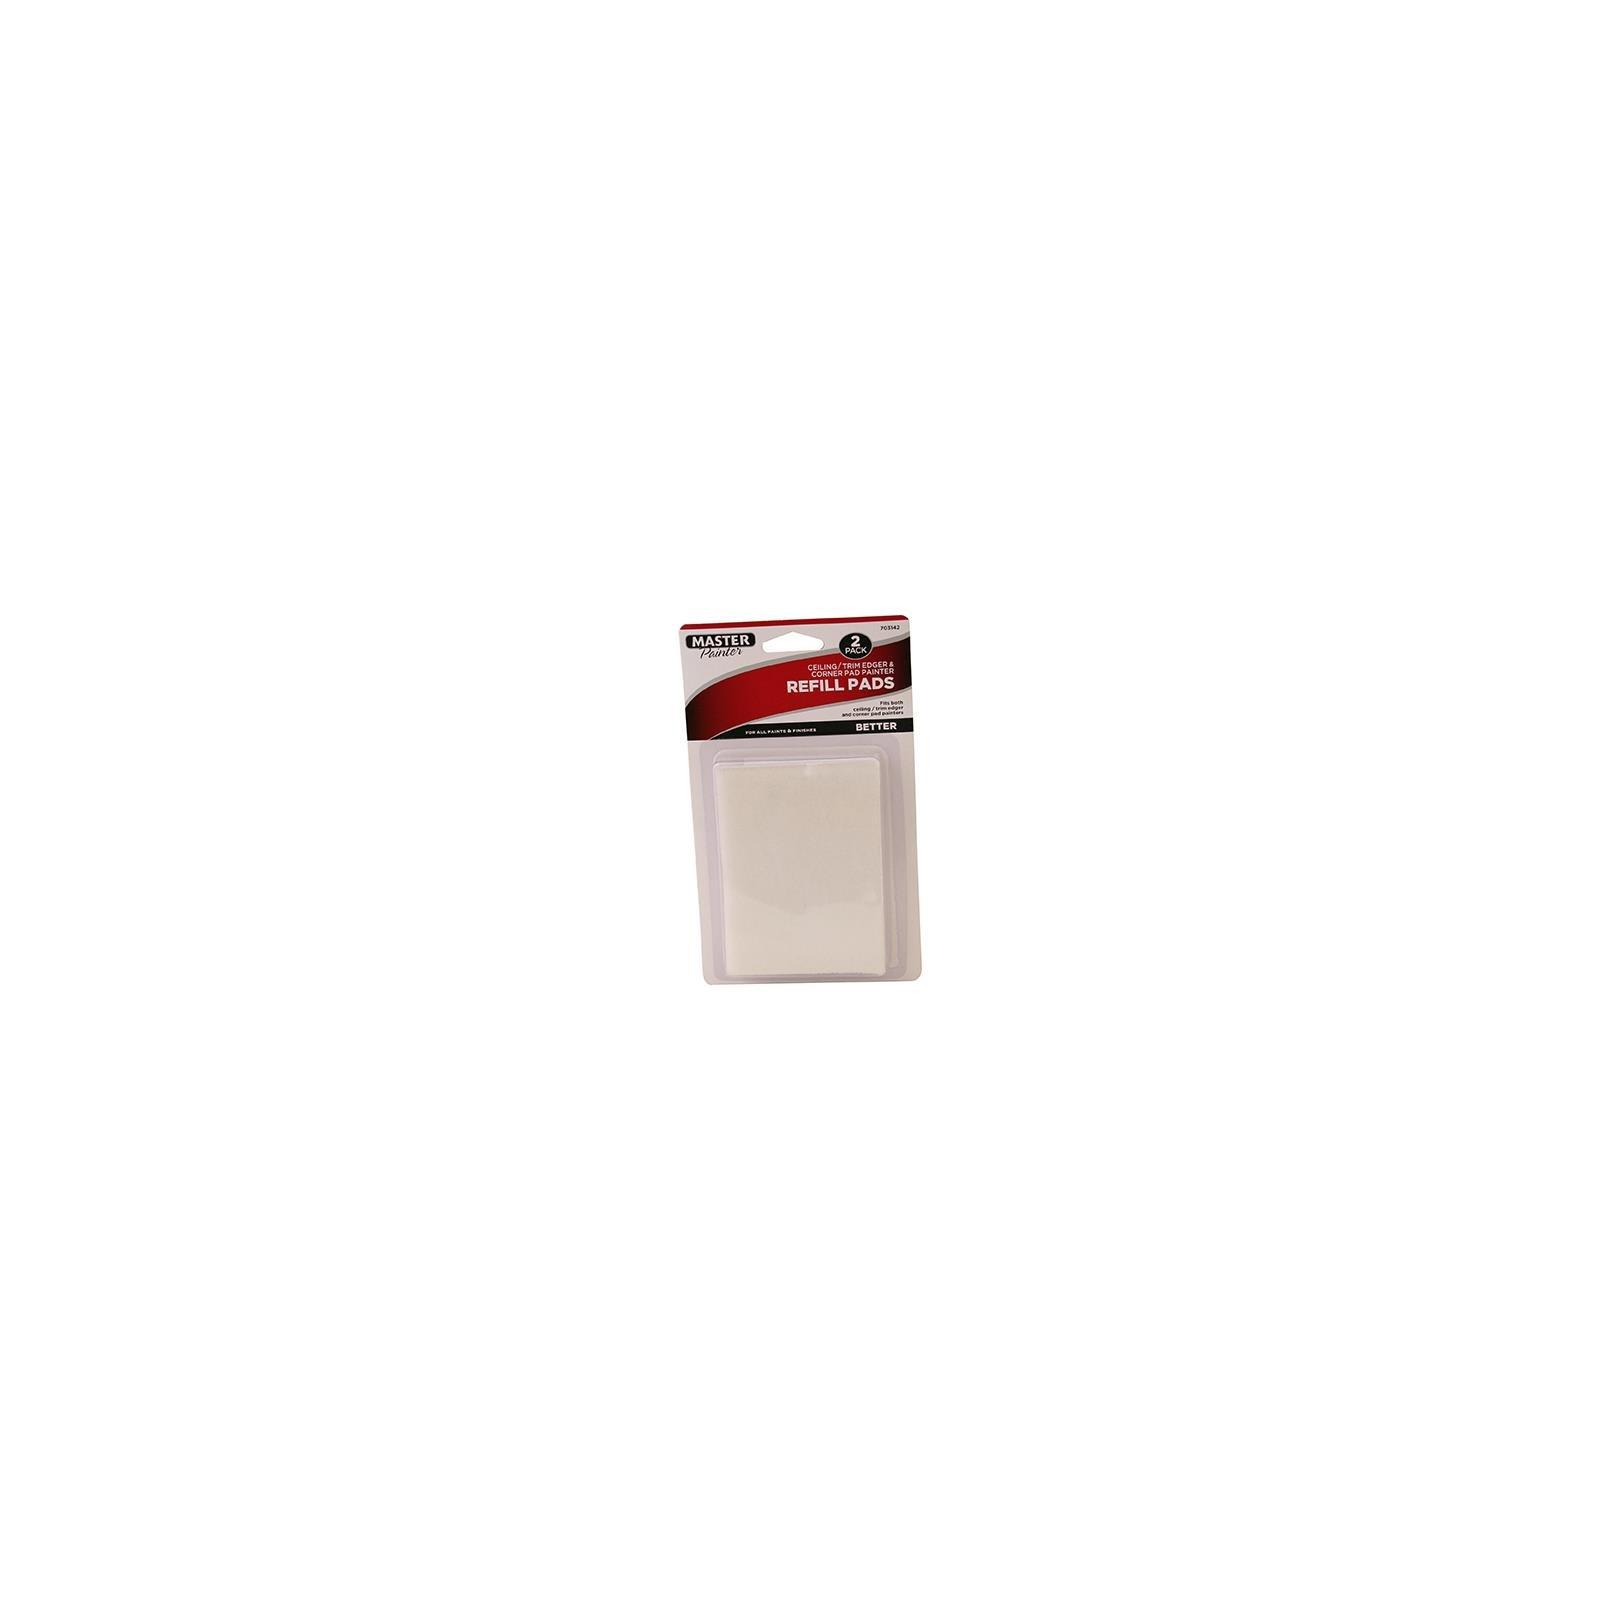 True Value Applicators 70111TV Paint Edger & Corner Painter Refill Pads, 2-Pk. - Quantity 12 by True Value Hardware